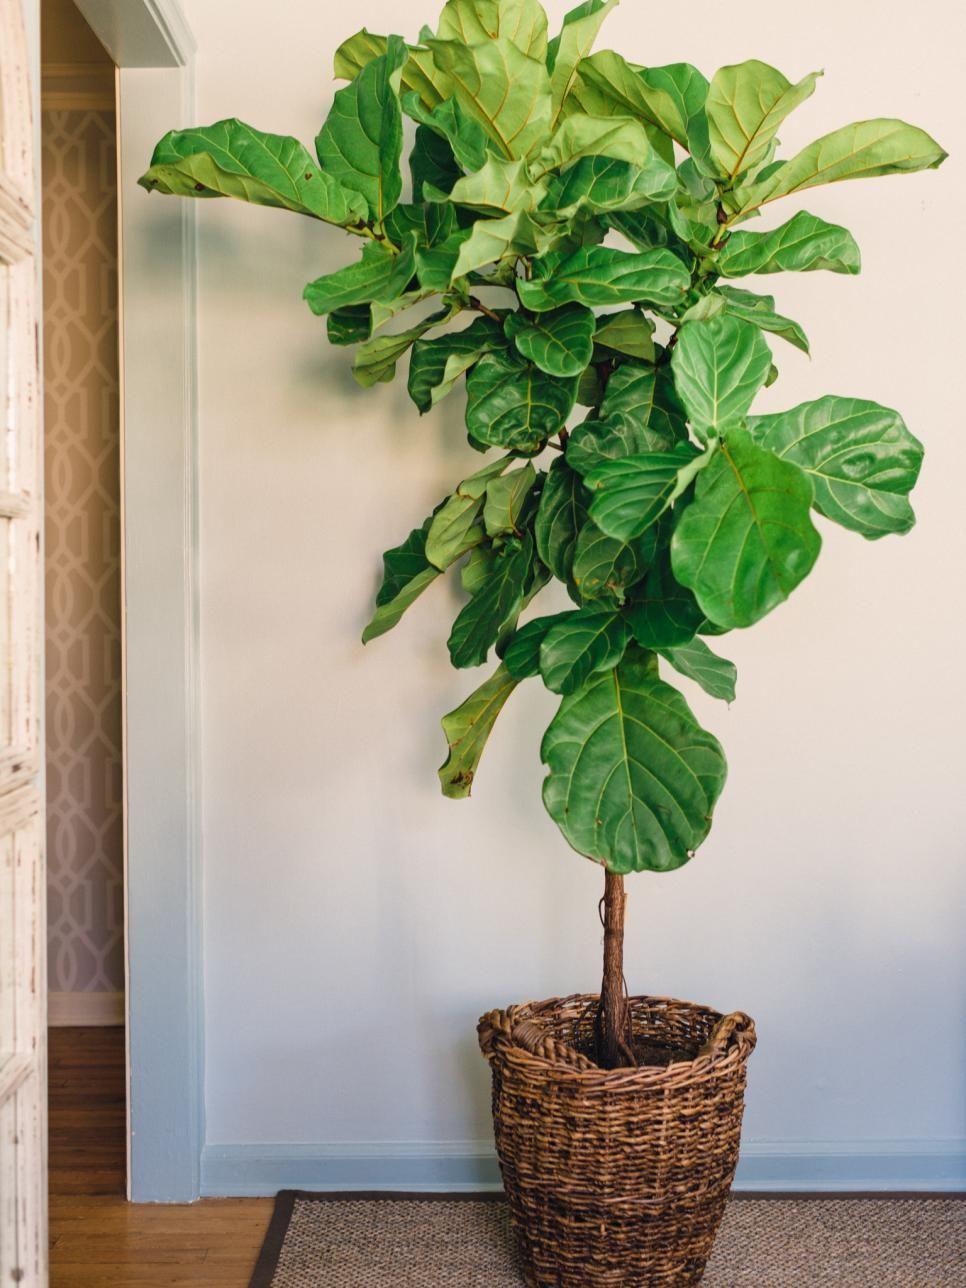 houseplants guide - Tall House Plants